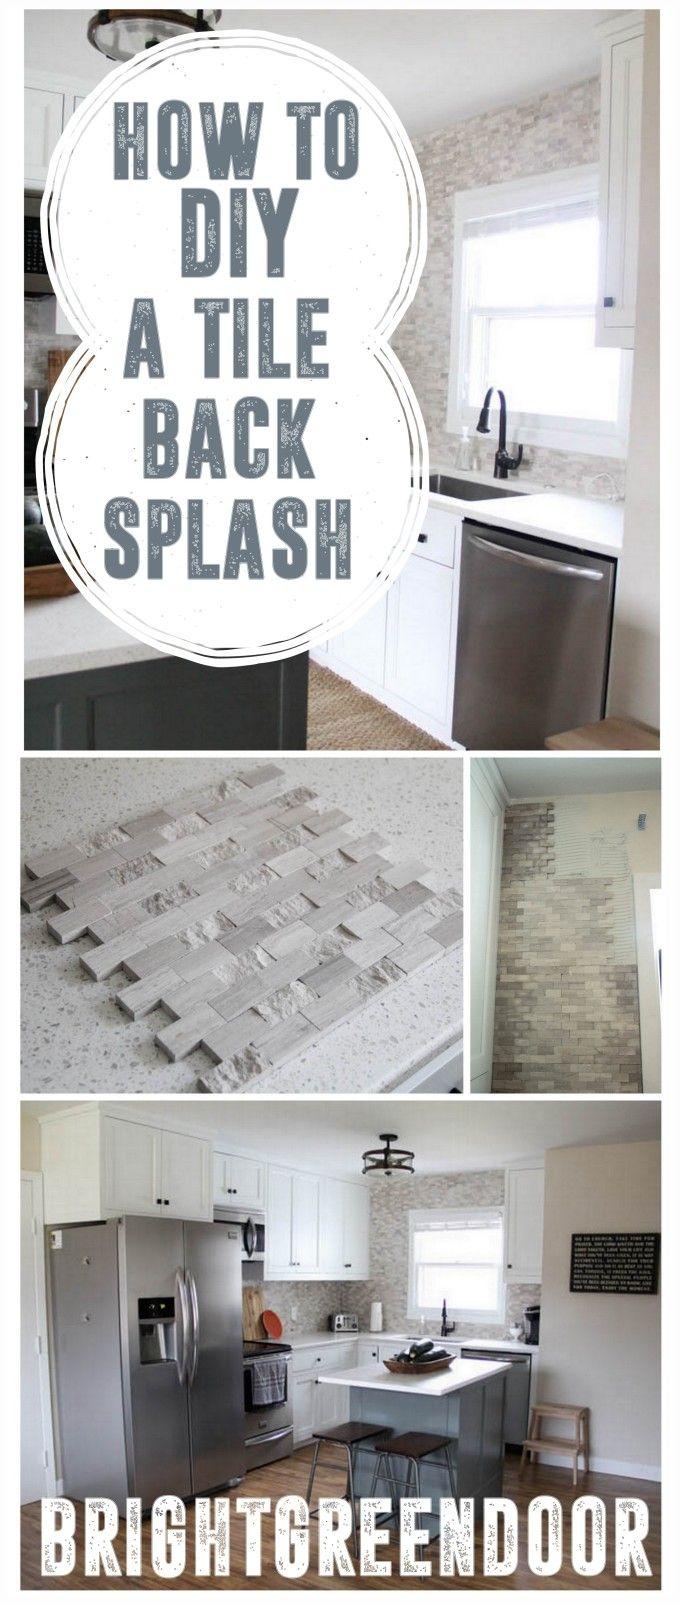 Install a Mosaic Tile Backsplash, How To Install Tile, How to Put up a Backsplash www.BrightGreenDoor.com